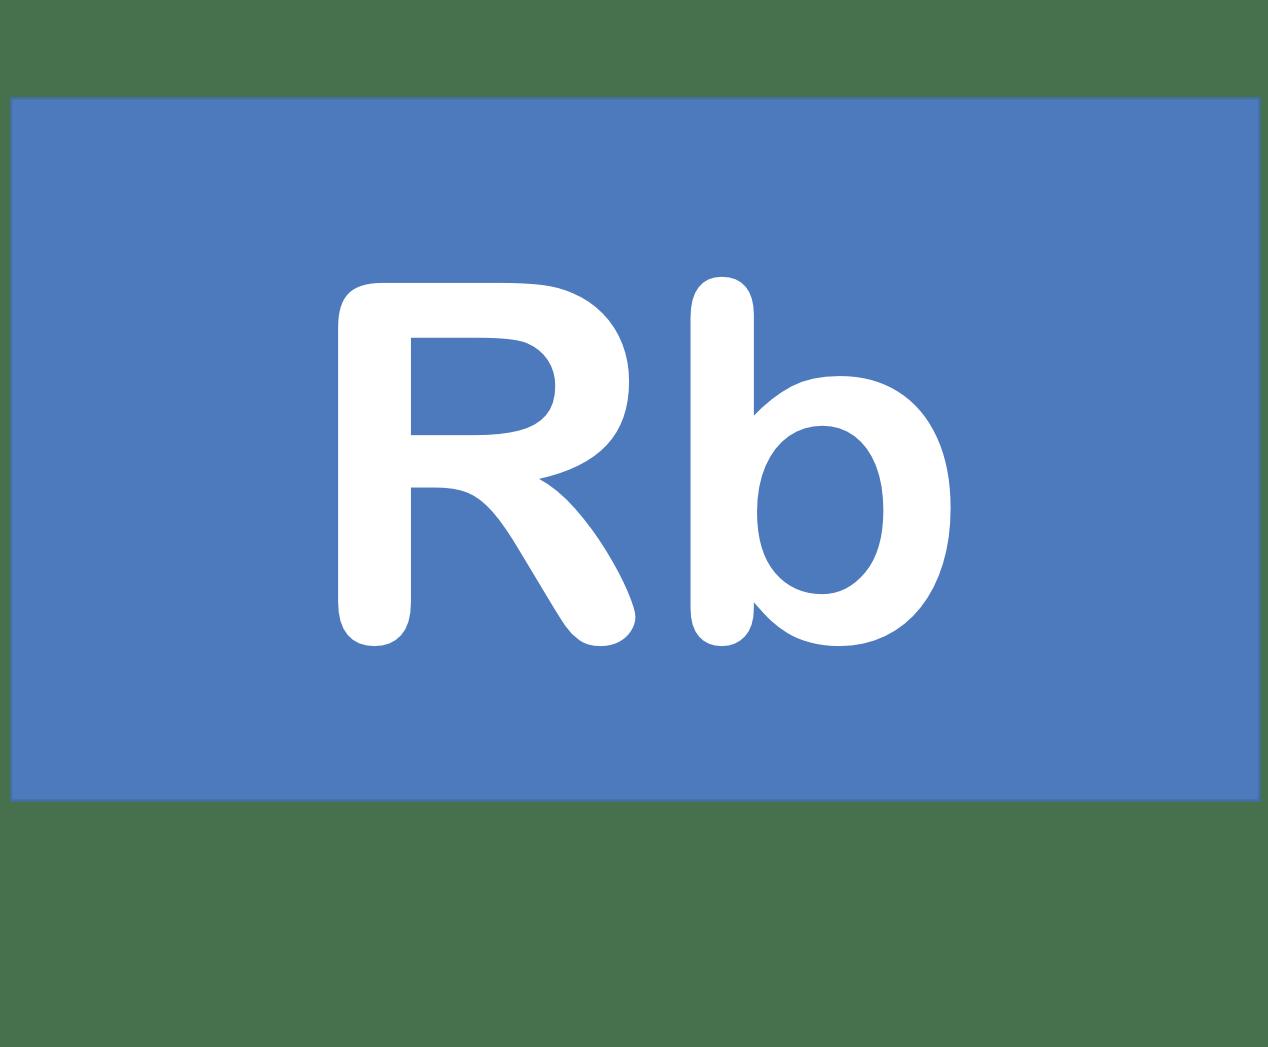 37 Rb ルビジウム Rubidium 元素 記号 周期表 化学 原子